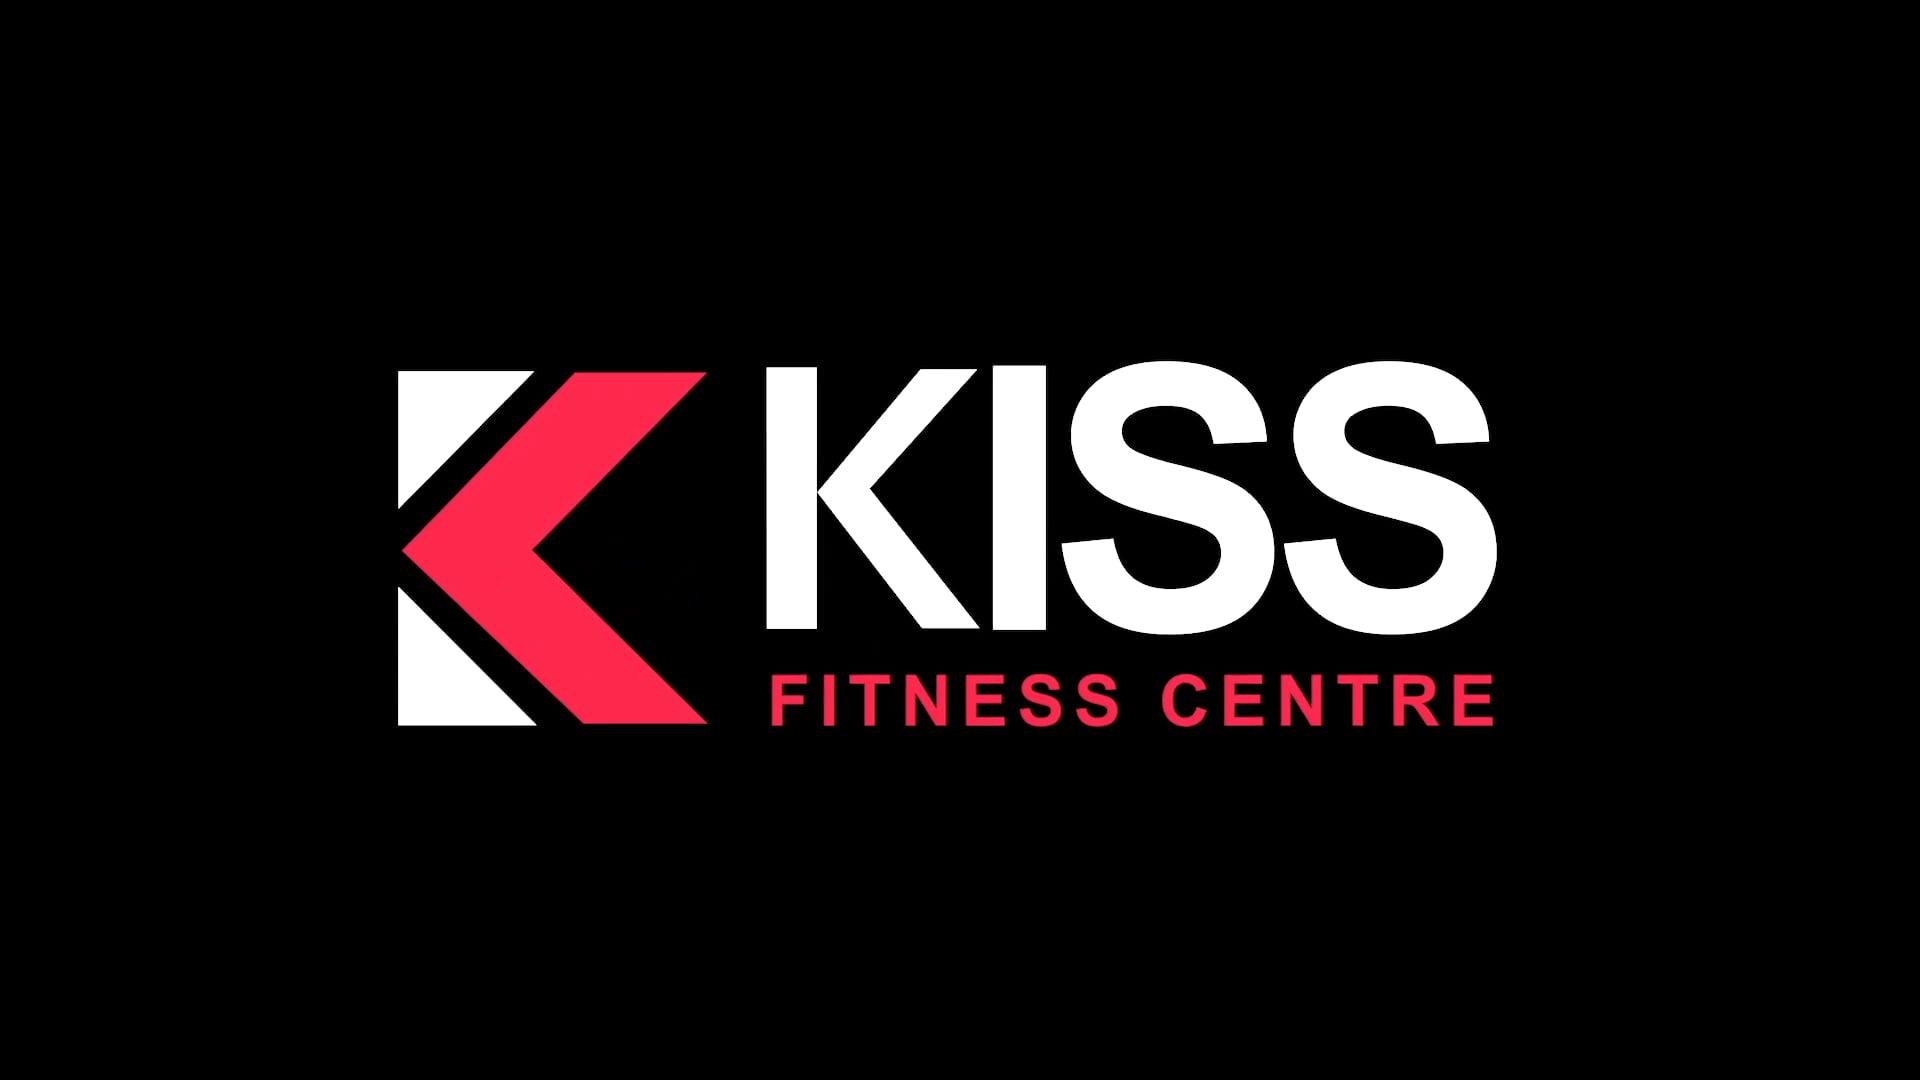 Kiss Fitness Centre Promo